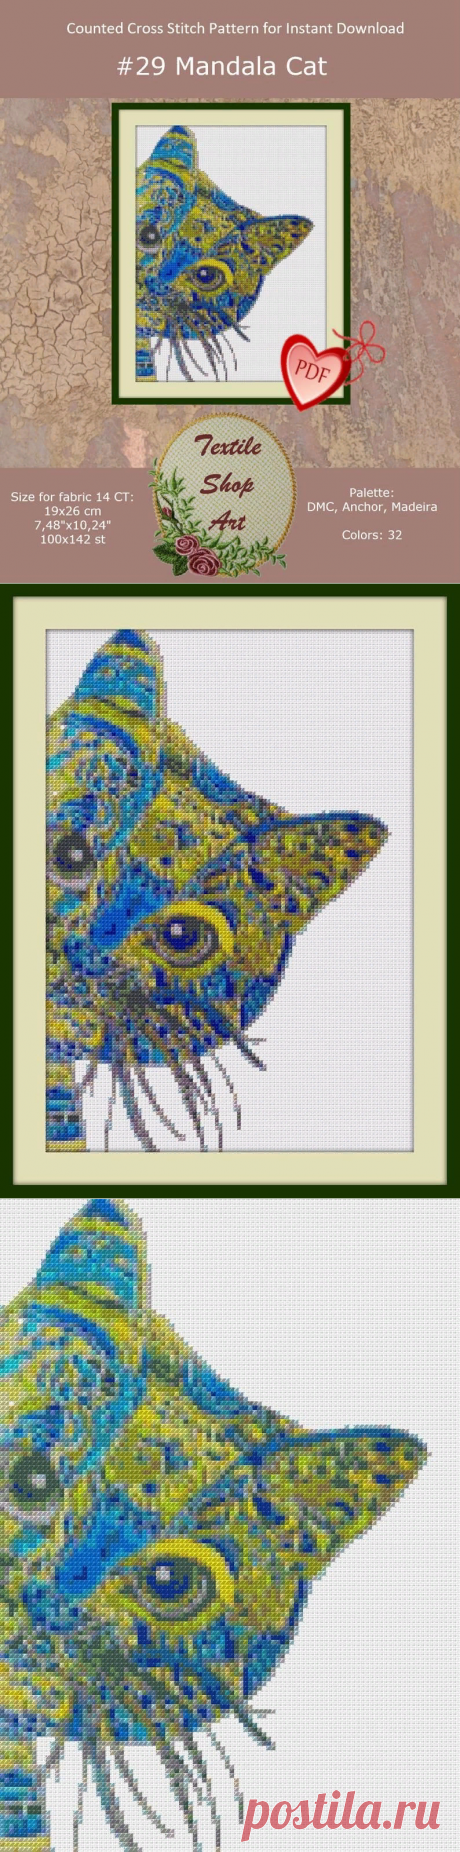 Mandala Cat Modern Cross Stitch Pattern Cross Stitch Design | Etsy